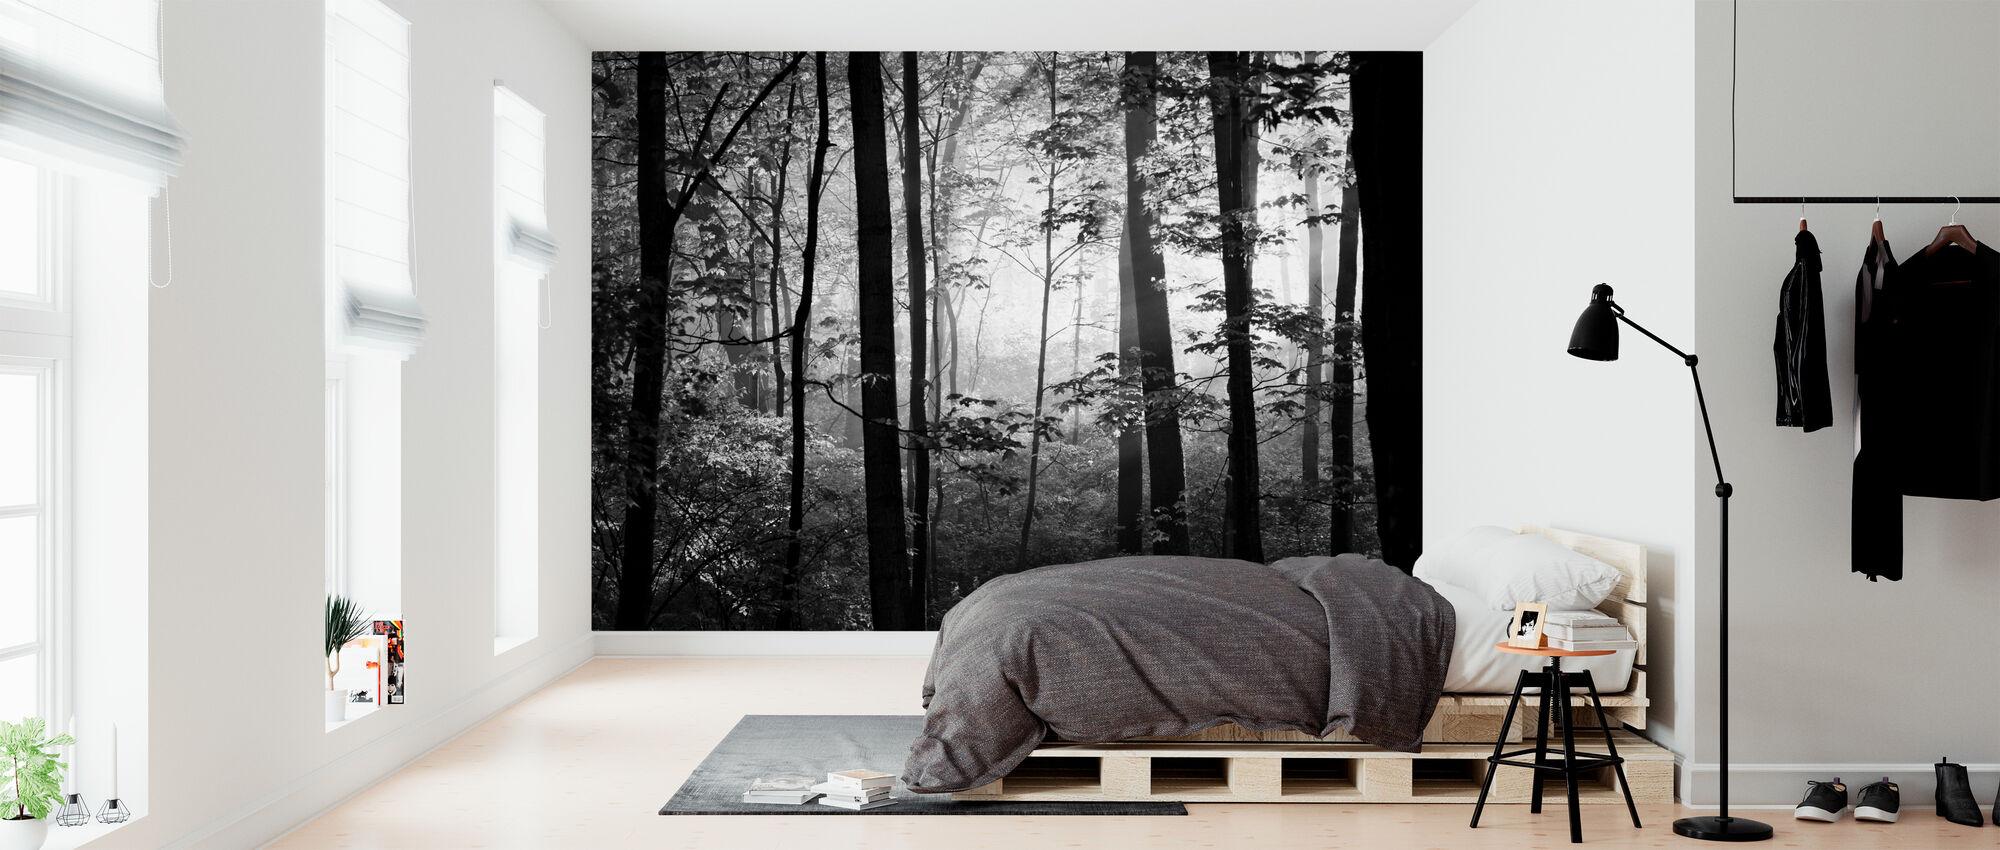 Early Morning - b/w - Wallpaper - Bedroom